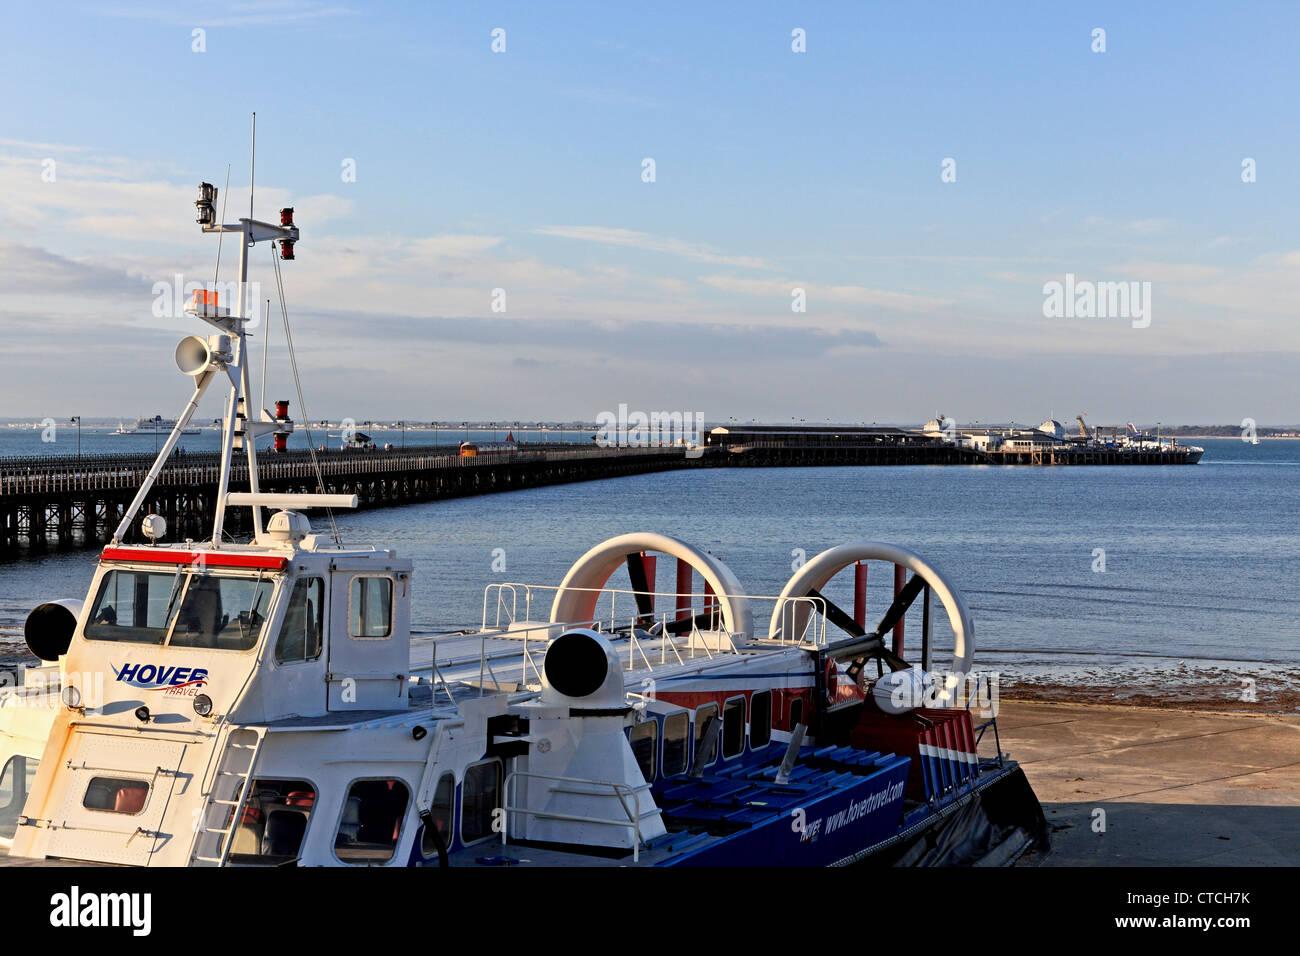 4147. Hovercraft Harbour, Ryde, Isle of Wight, UK - Stock Image